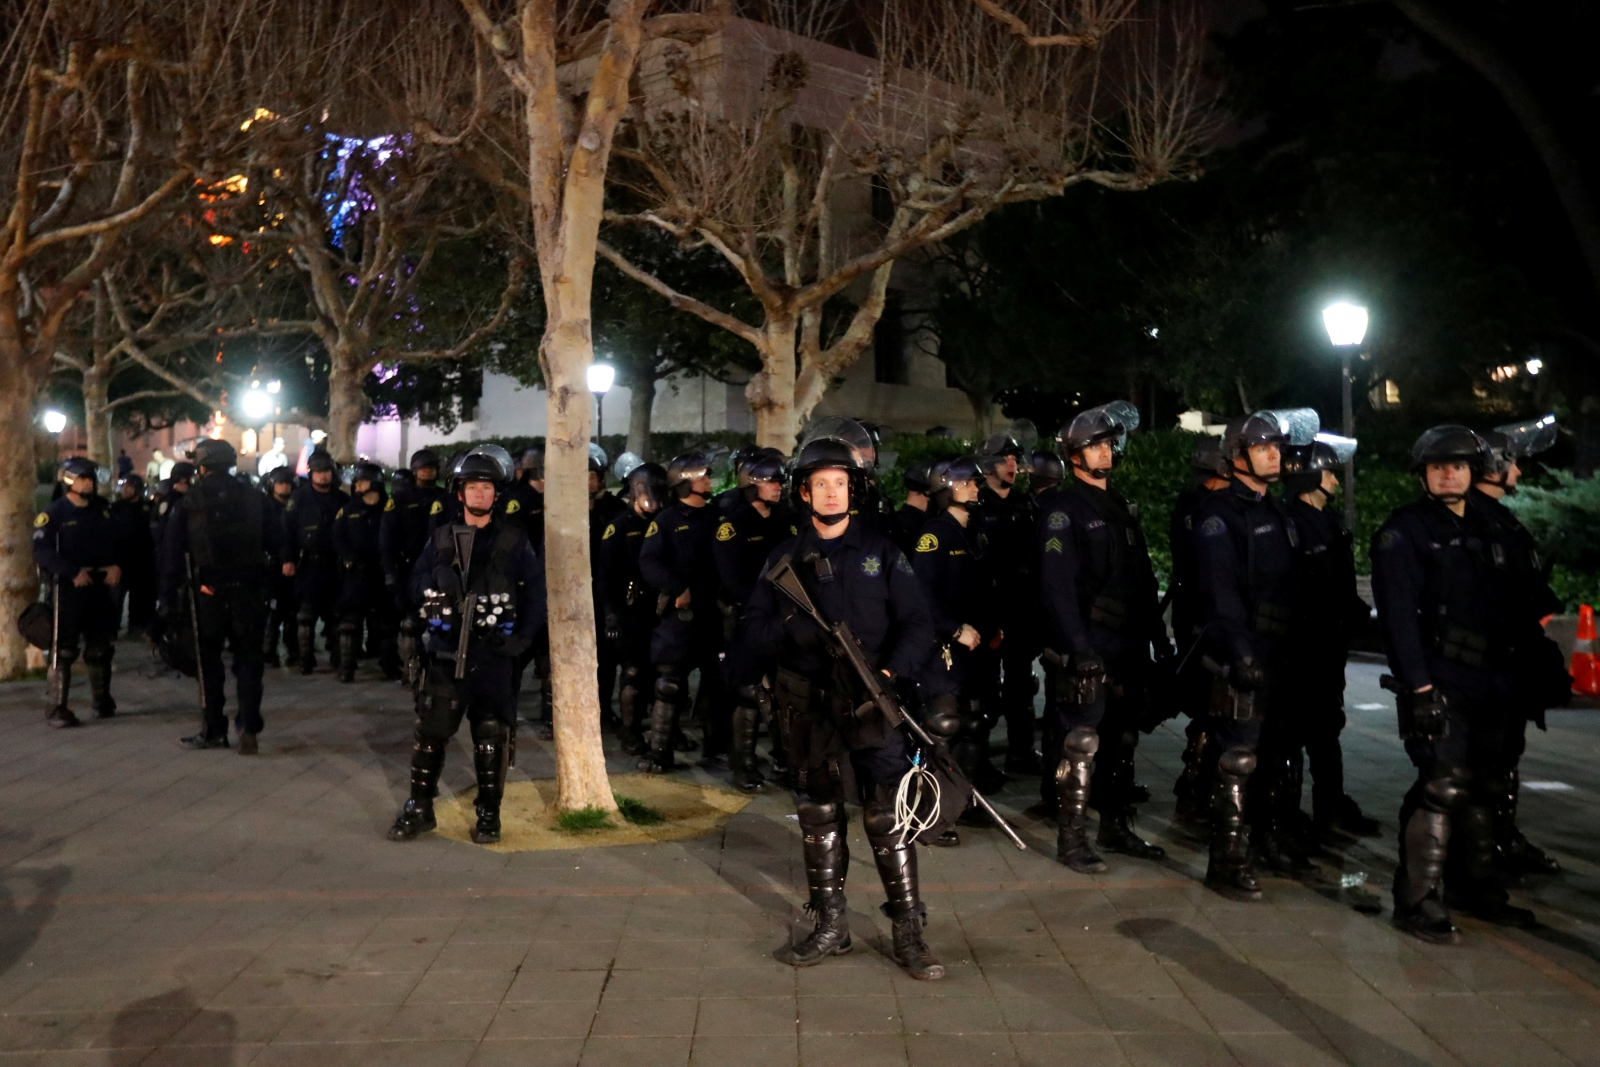 CALIFORNIA-UCBERKELEY/PROTESTS